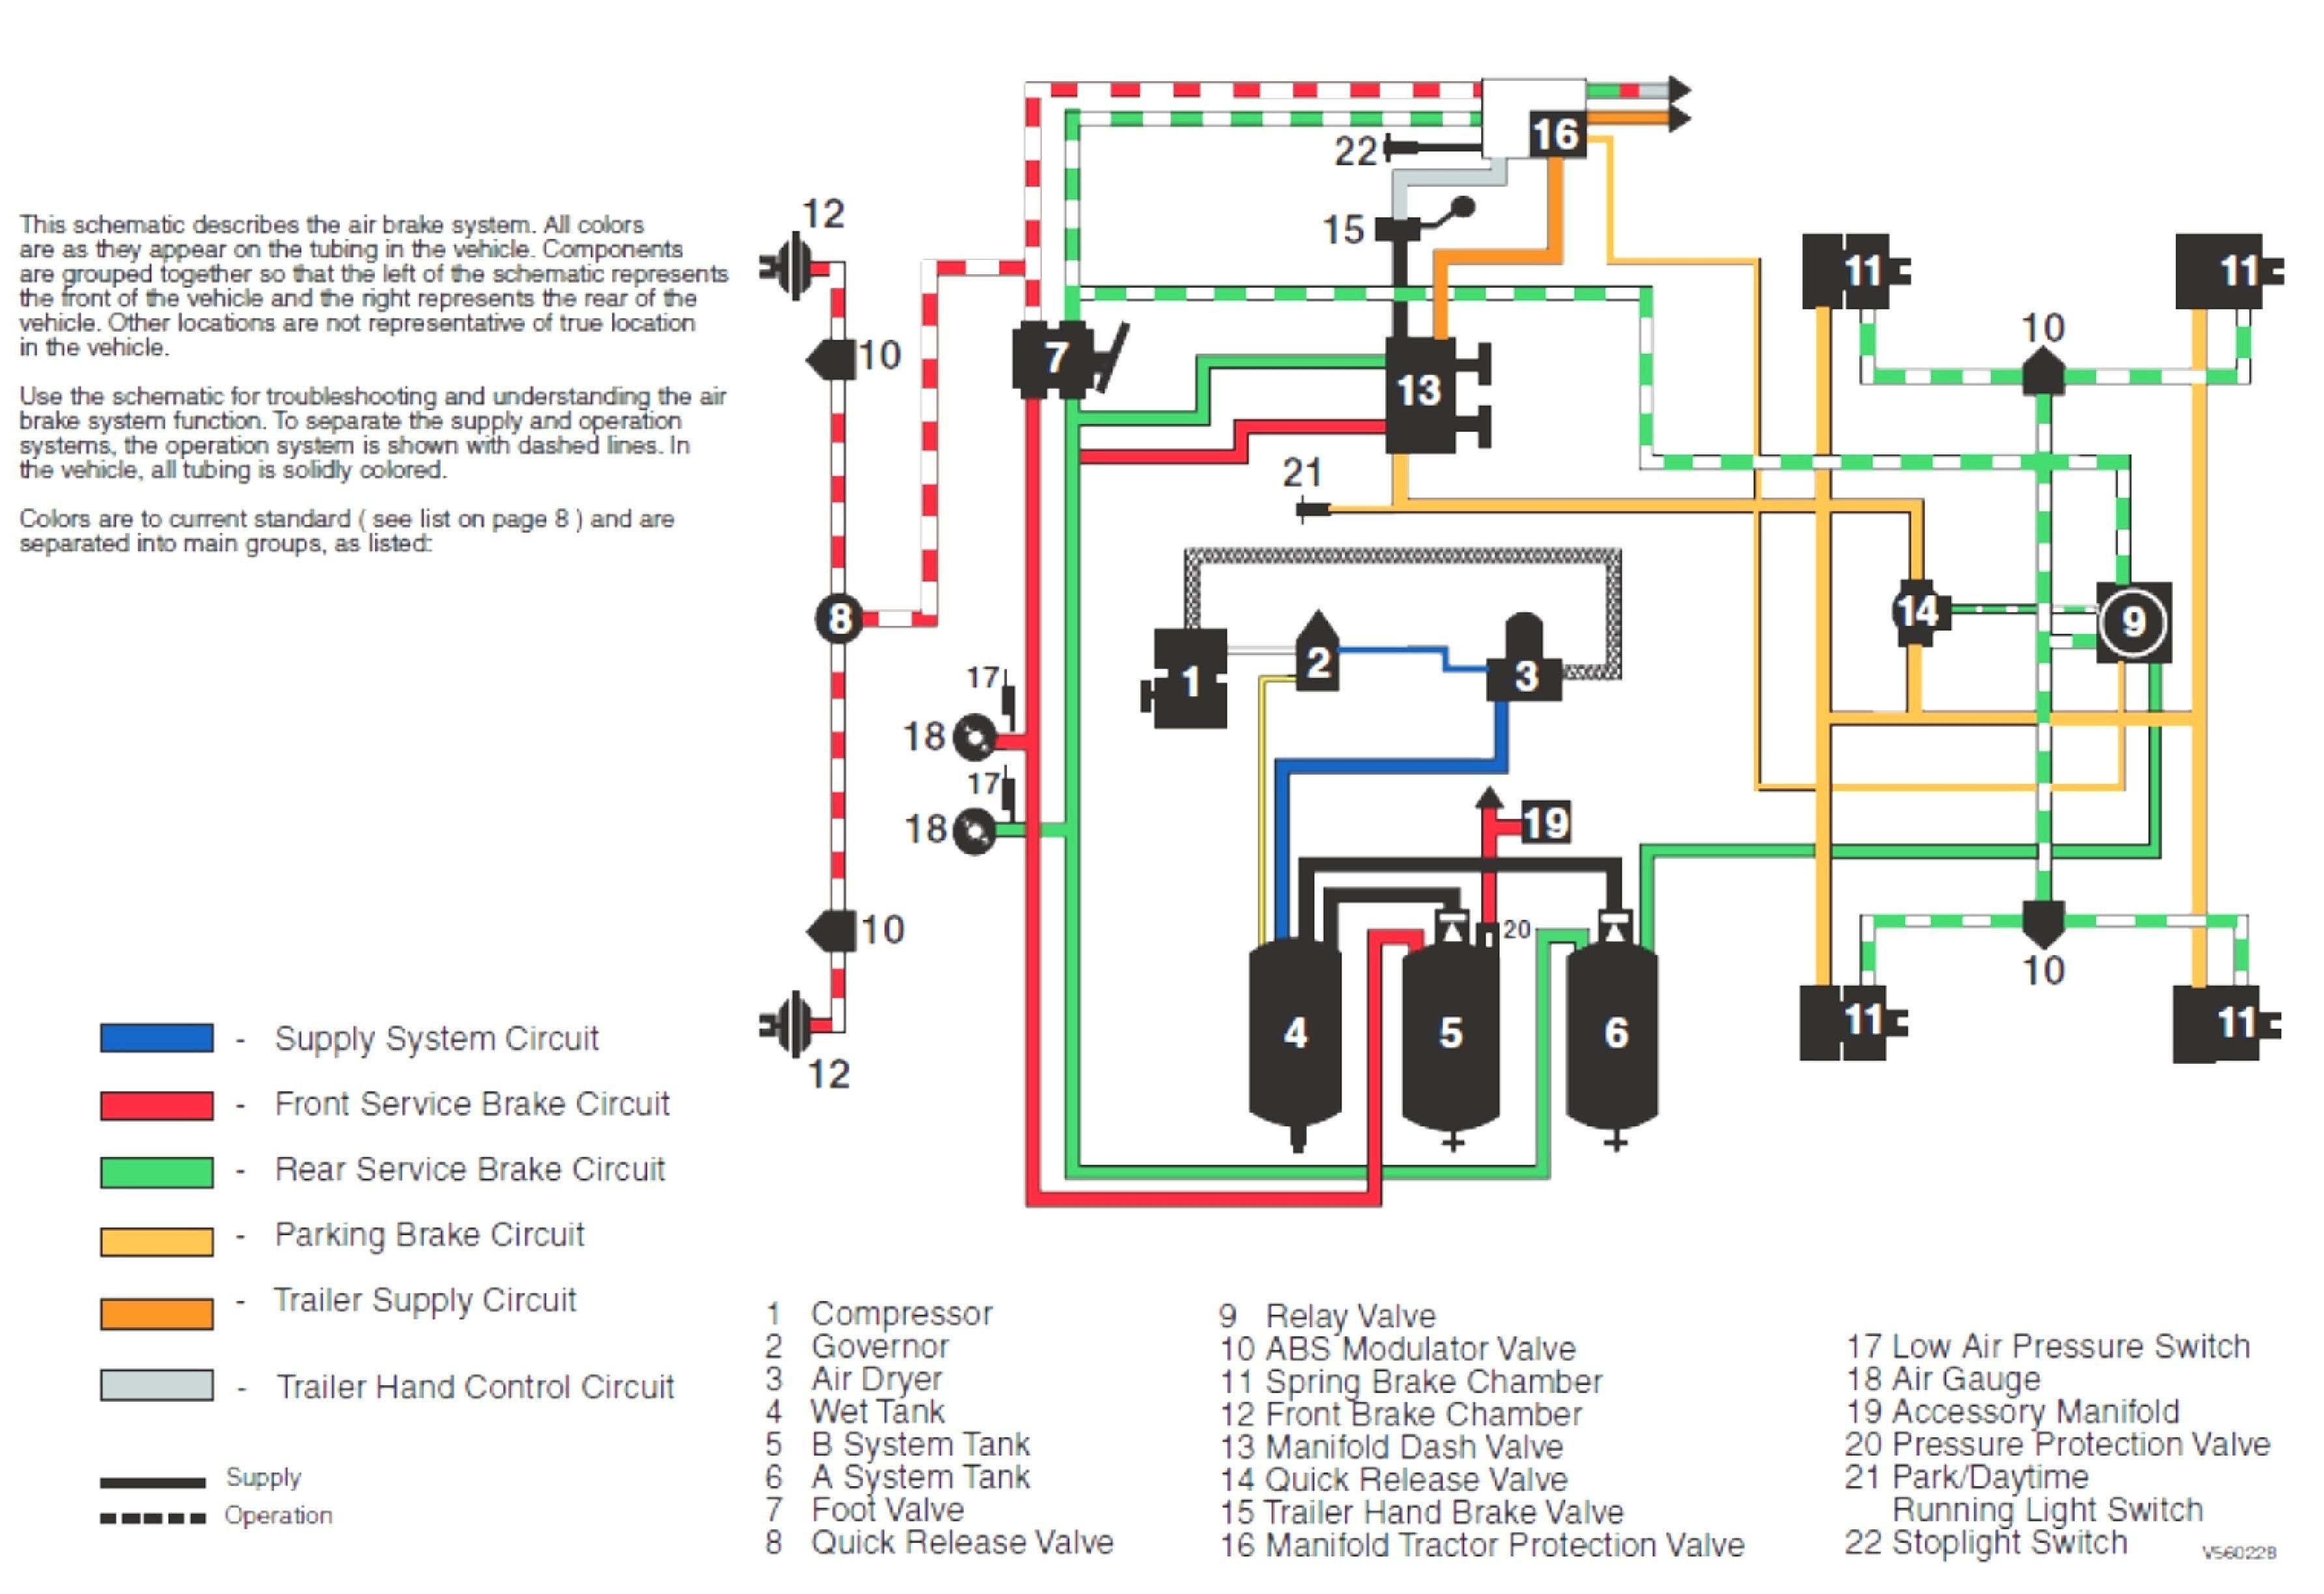 Front Brake Diagram Wiring Diagram for Trailer with Brakes Book Wiring Diagrams for Of Front Brake Diagram